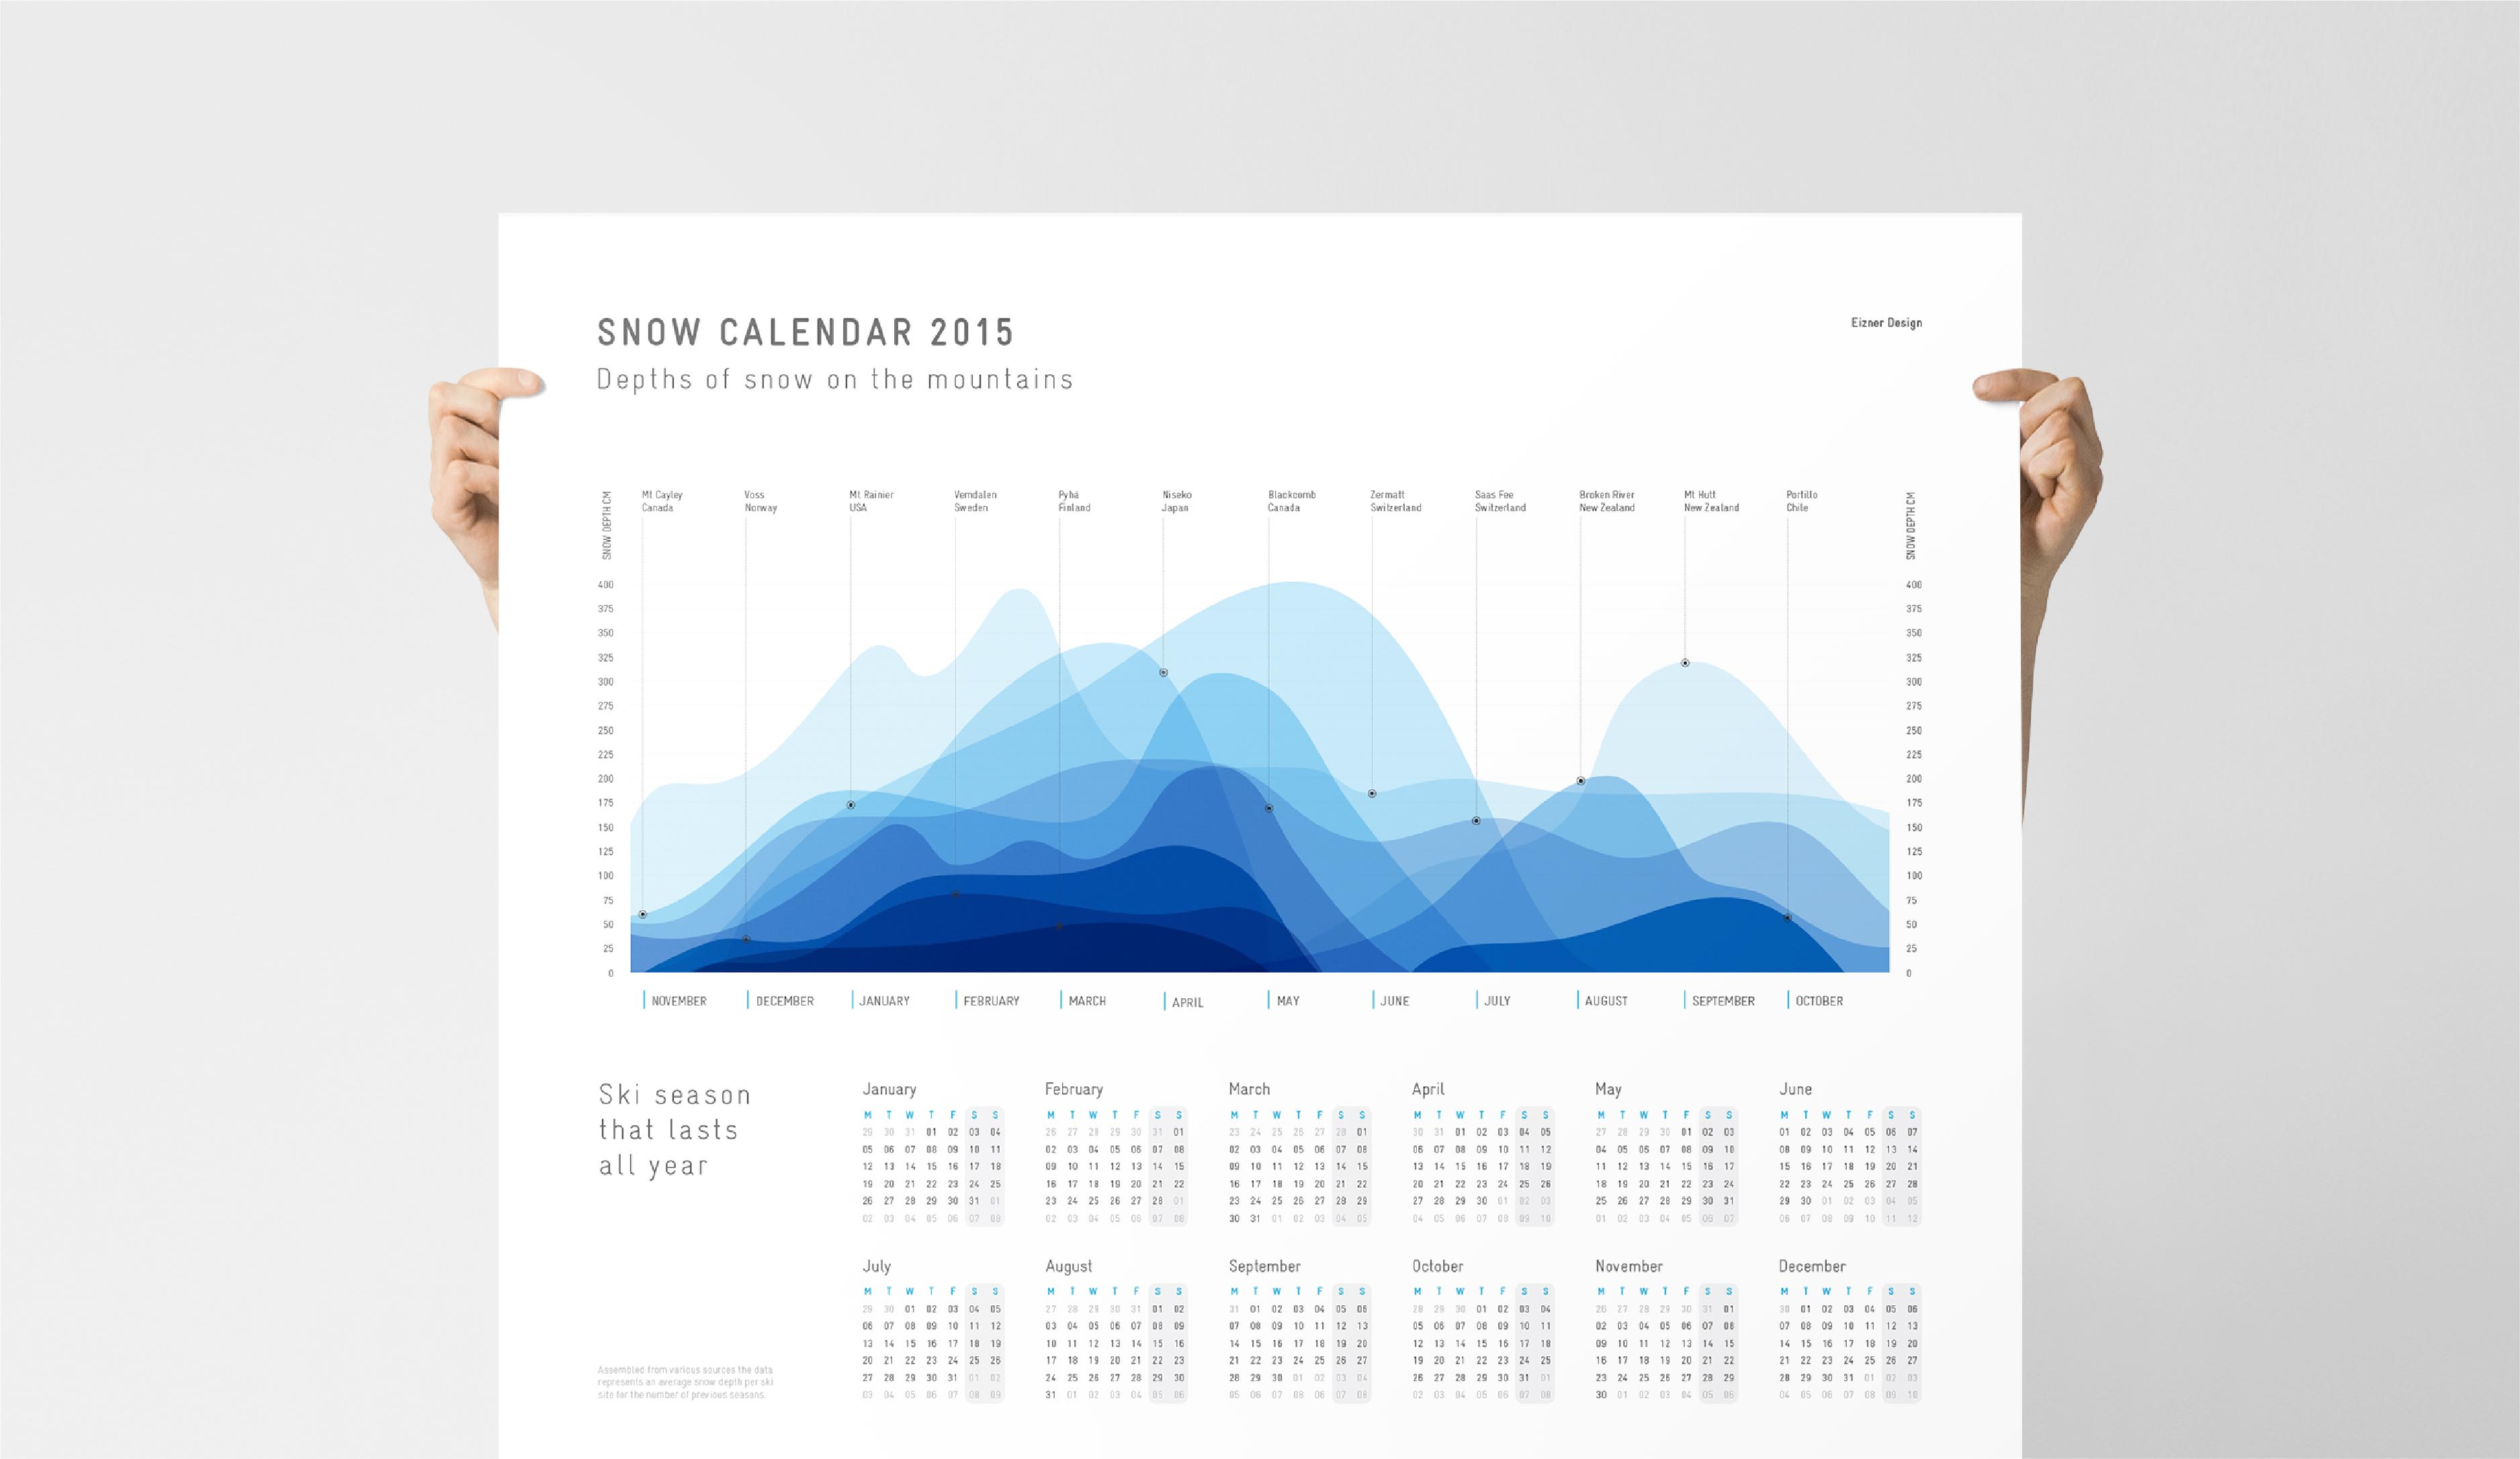 Snow calendar